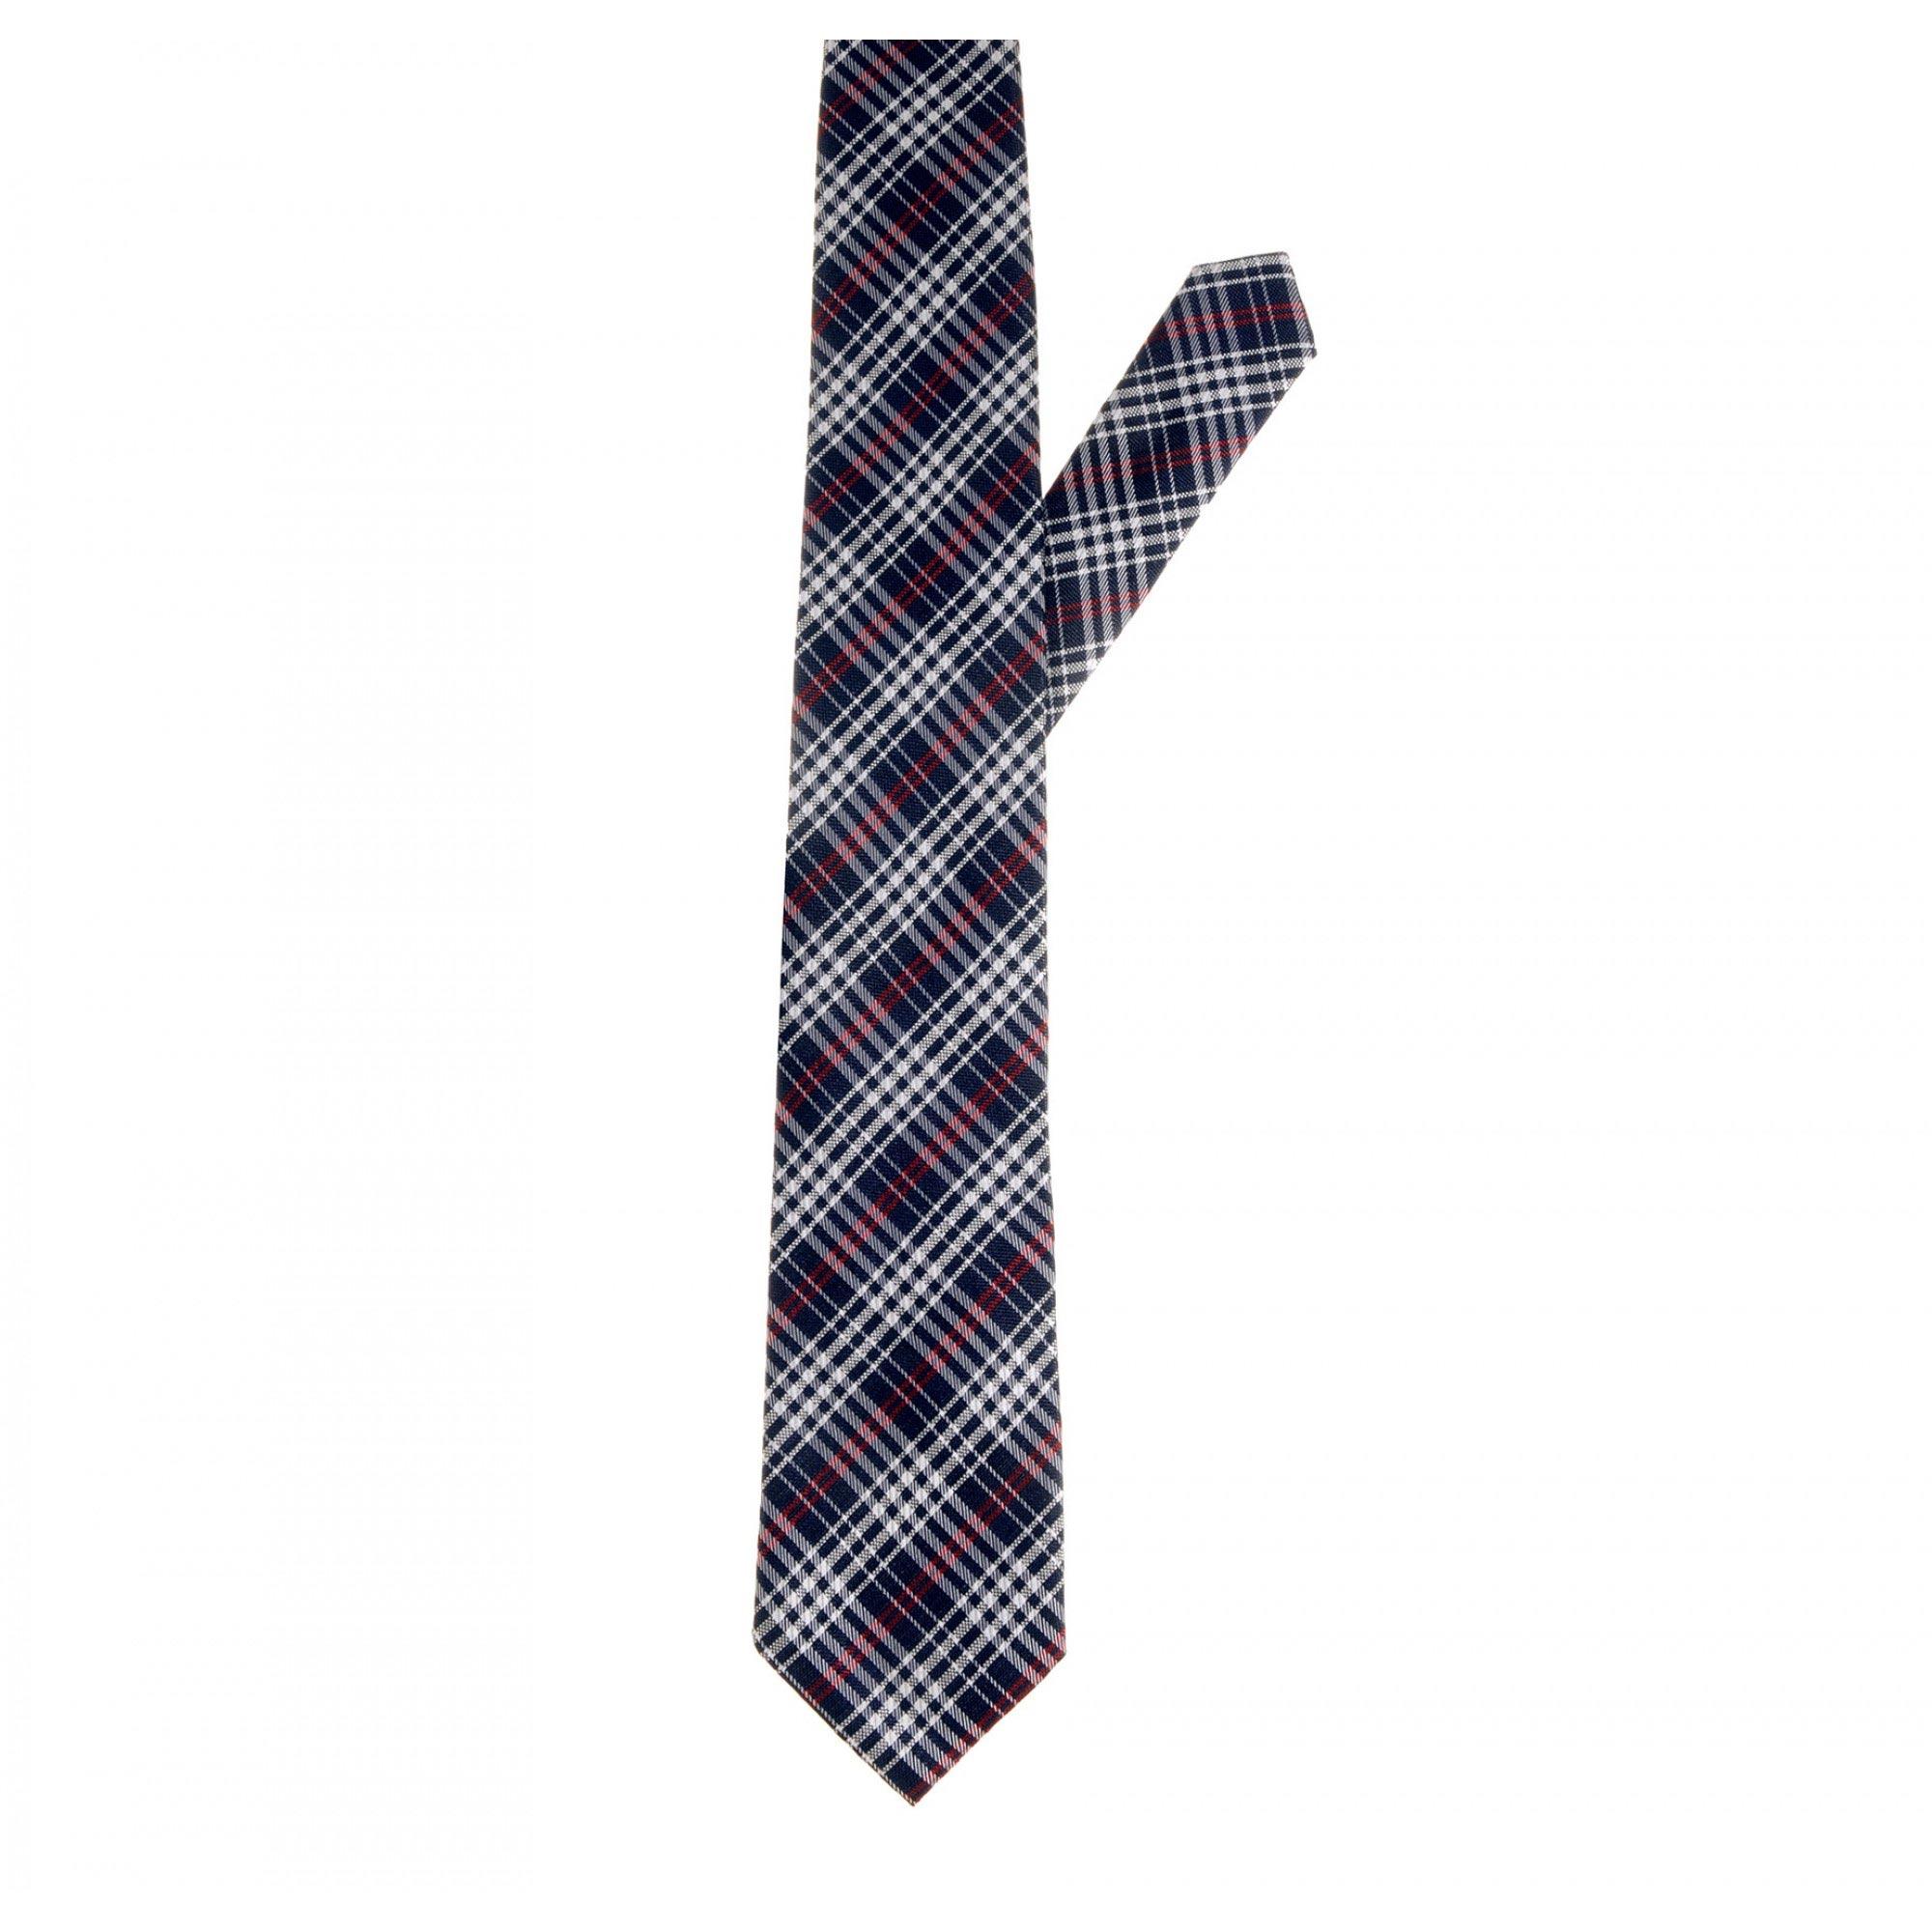 Блузки с коротким рукавом купить доставка